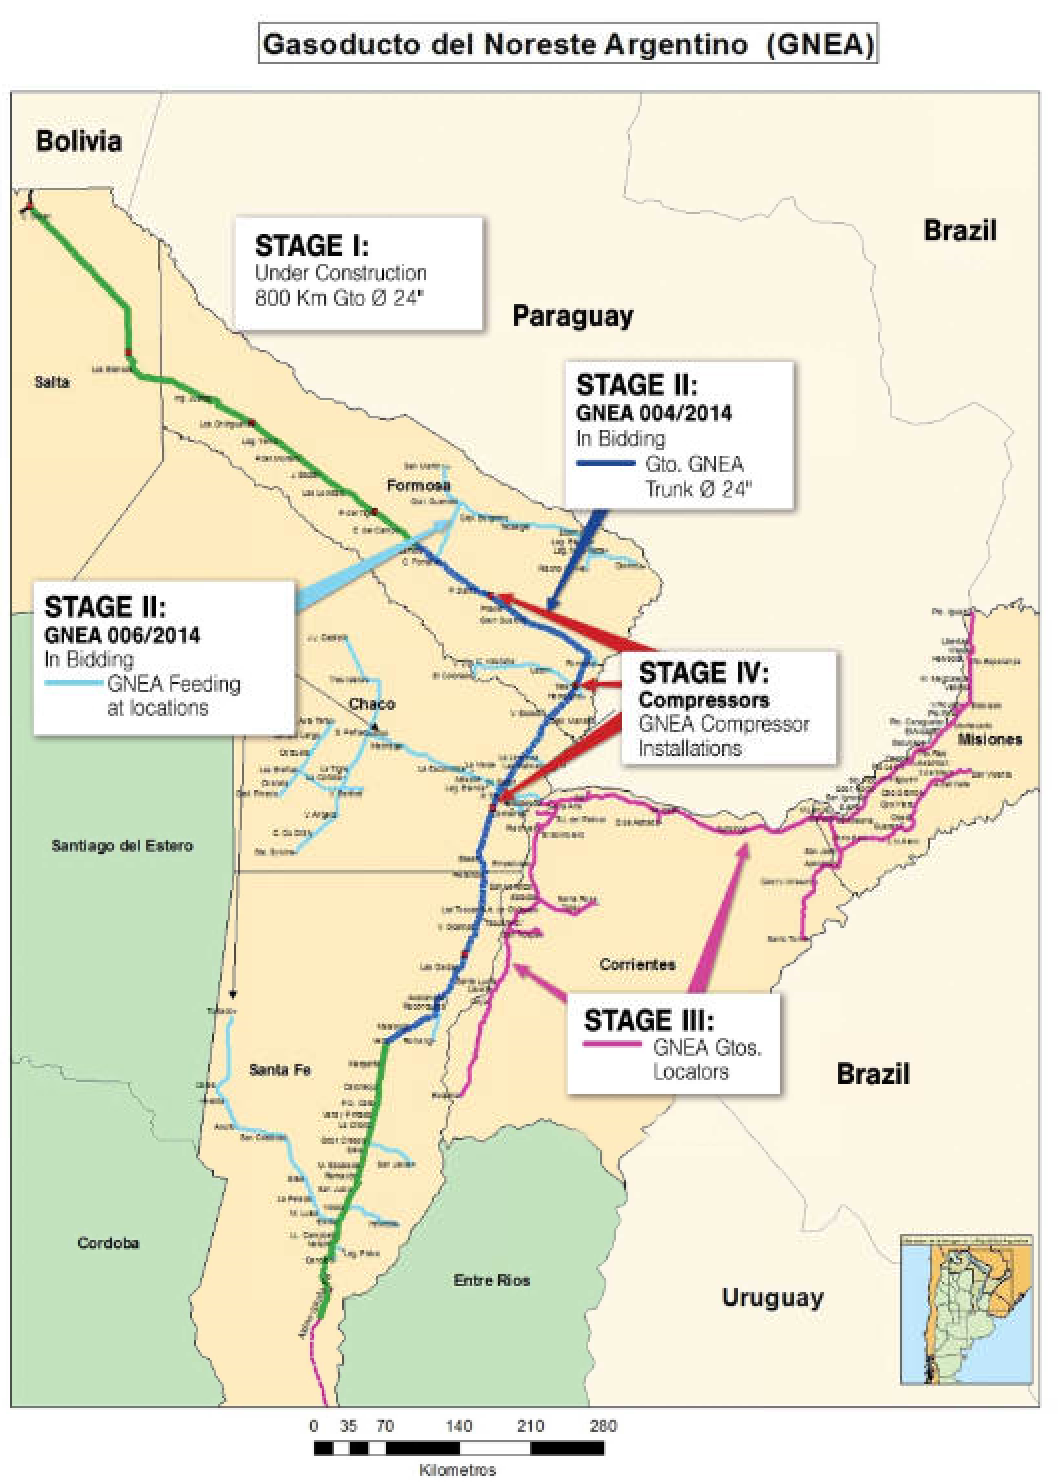 Argentina pipelines Nov 17